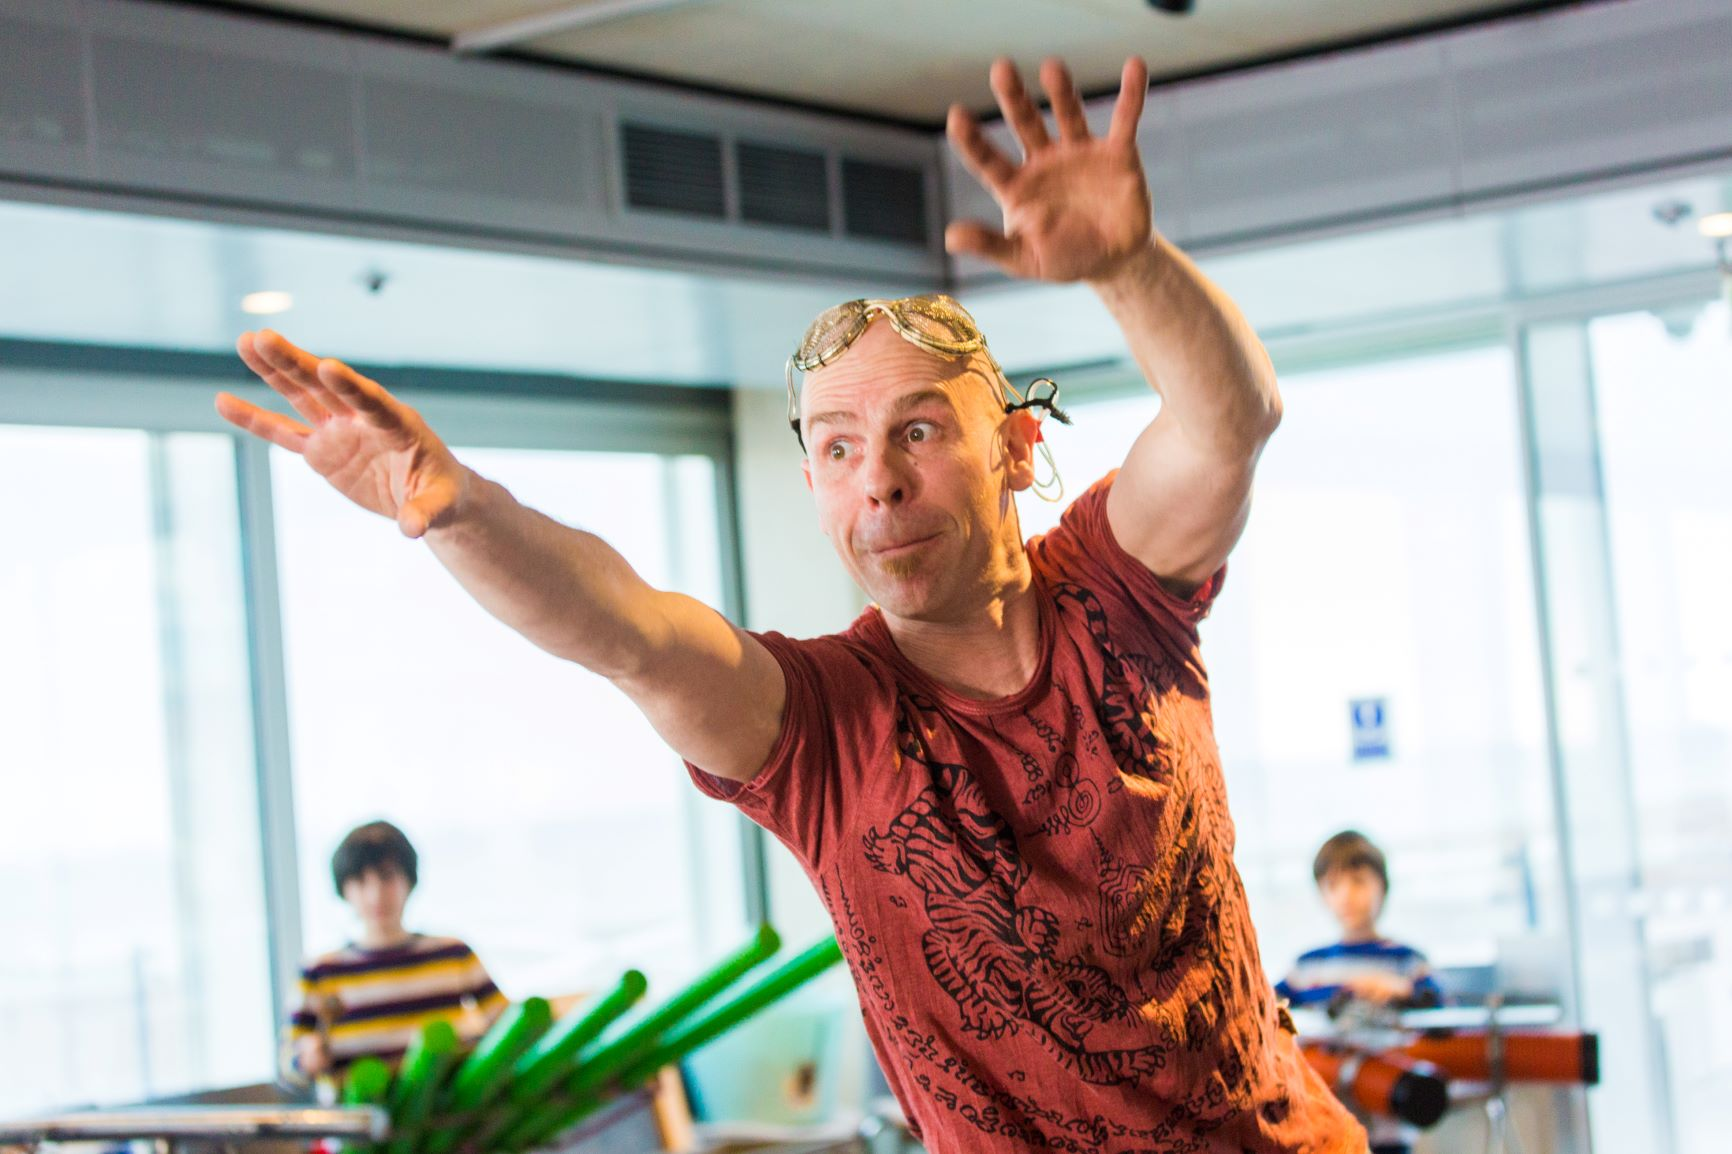 Music Making And Sound Sculpture Build workshop mentored by Ben Gates